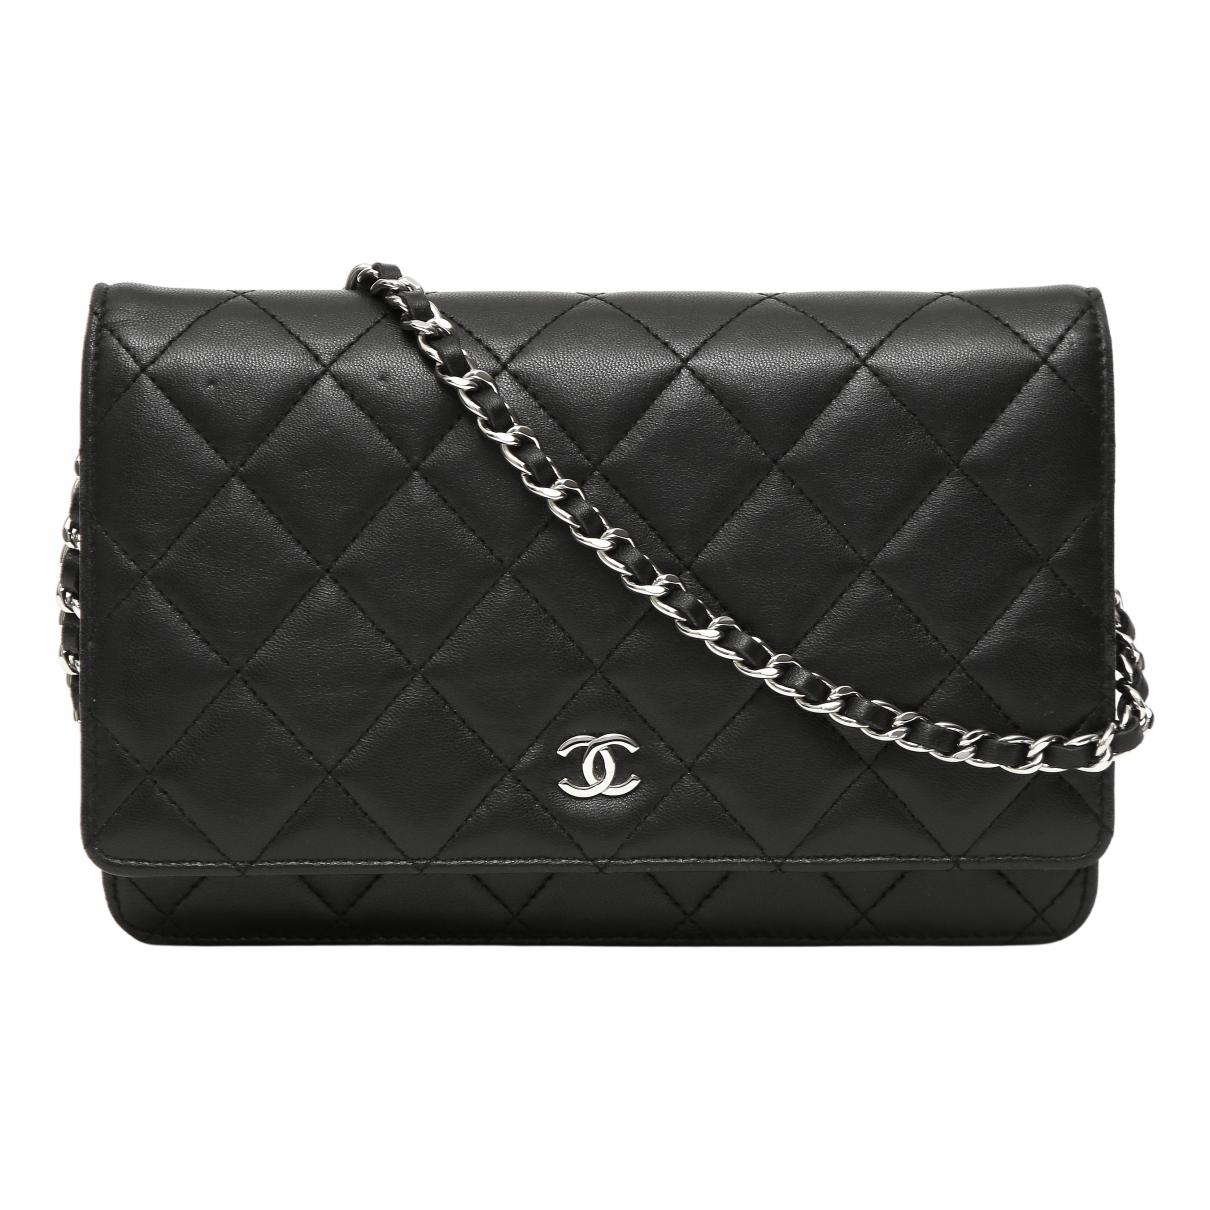 Chanel Wallet on Chain Black Leather handbag for Women N